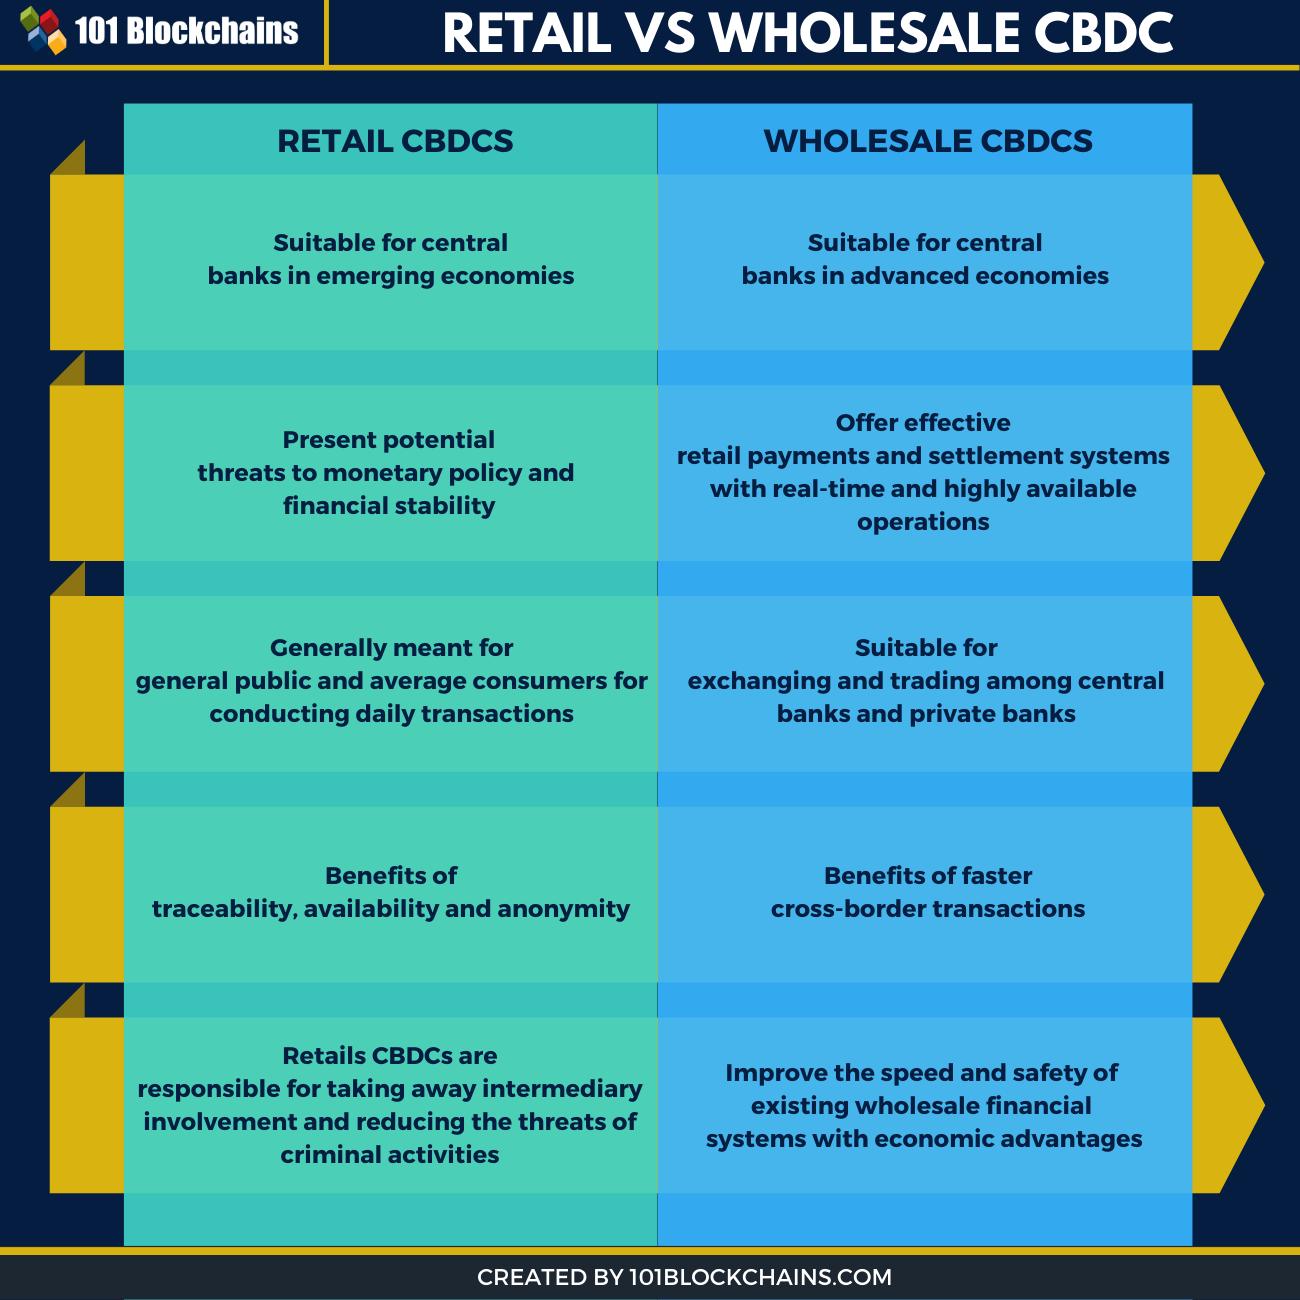 retail vs wholesale cbdc